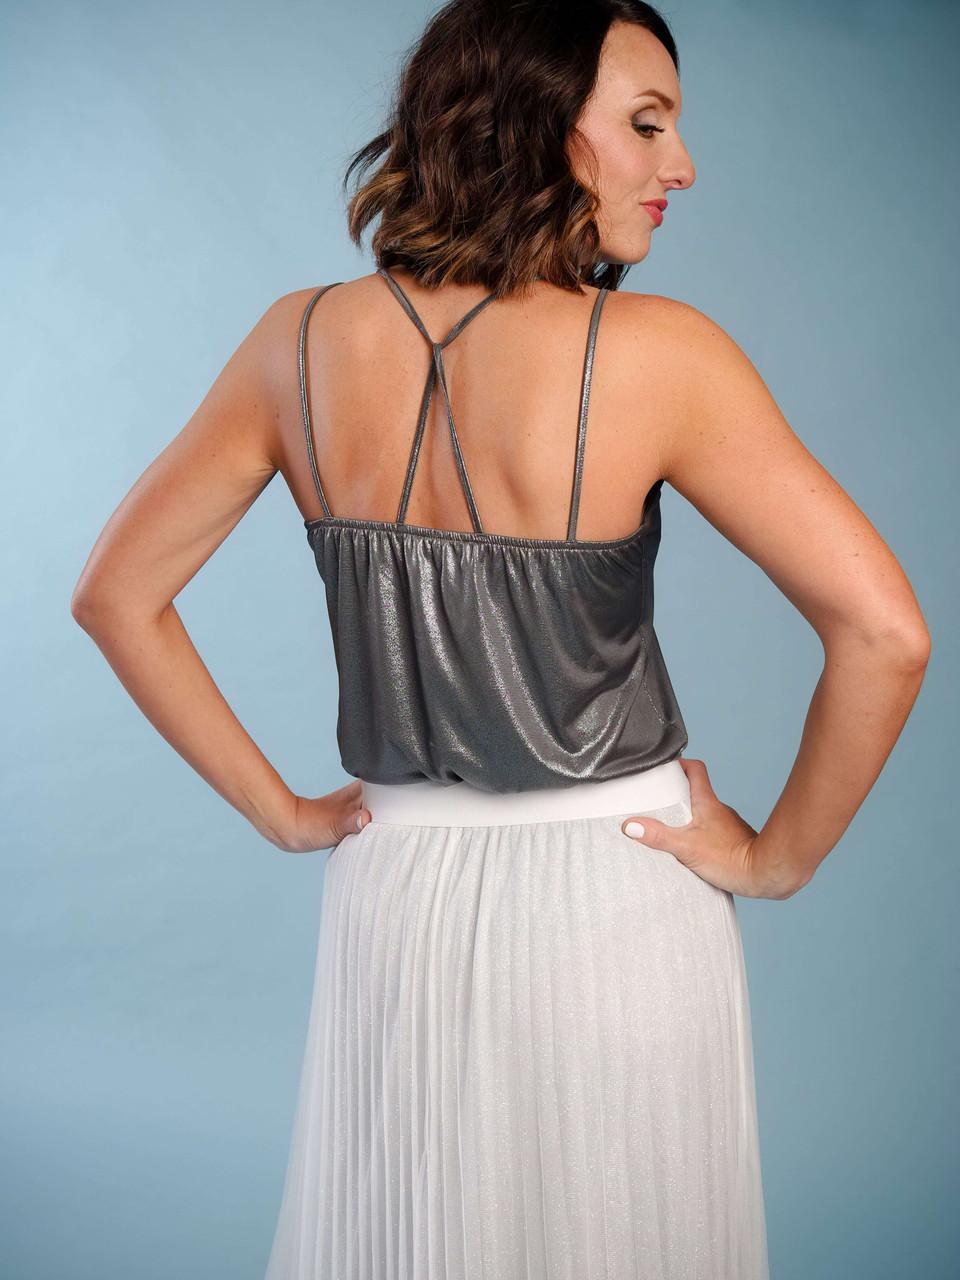 Iridescent grey v-neck modern camisole, Back crisscross straps, Model is wearing a small/medium.